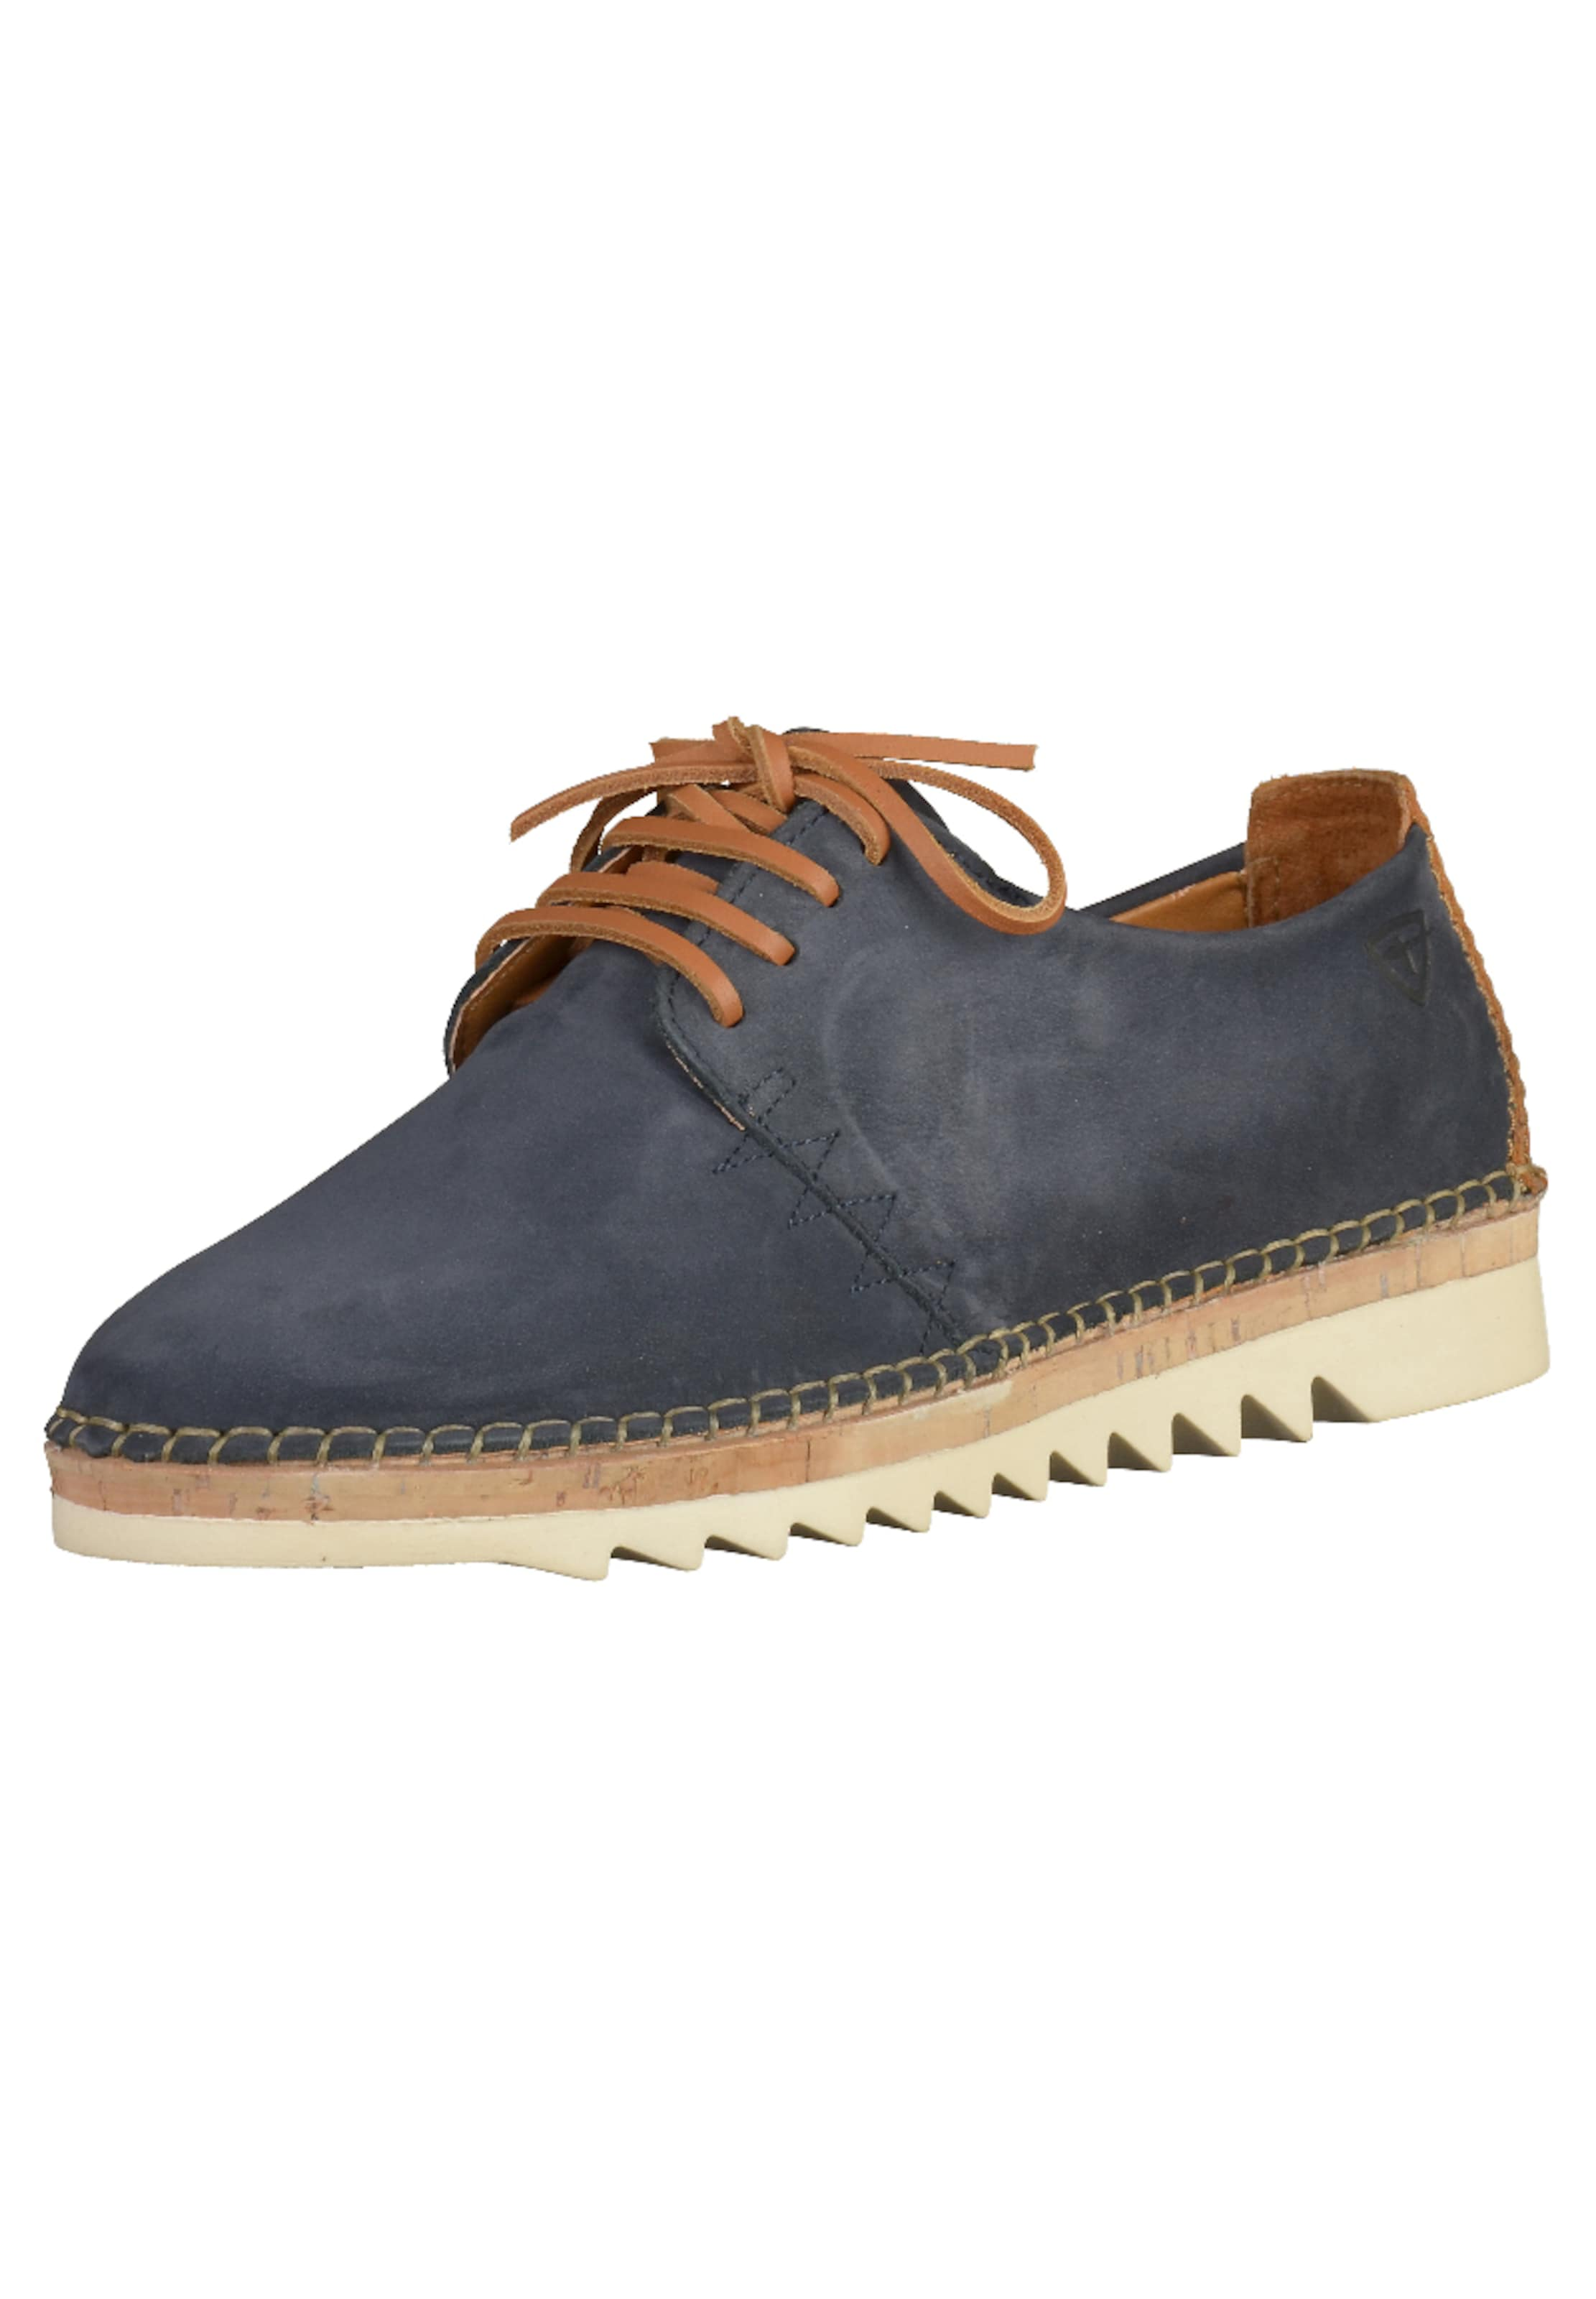 TAMARIS Halbschuhe Verschleißfeste billige Schuhe Hohe Qualität ... ab4e4310de